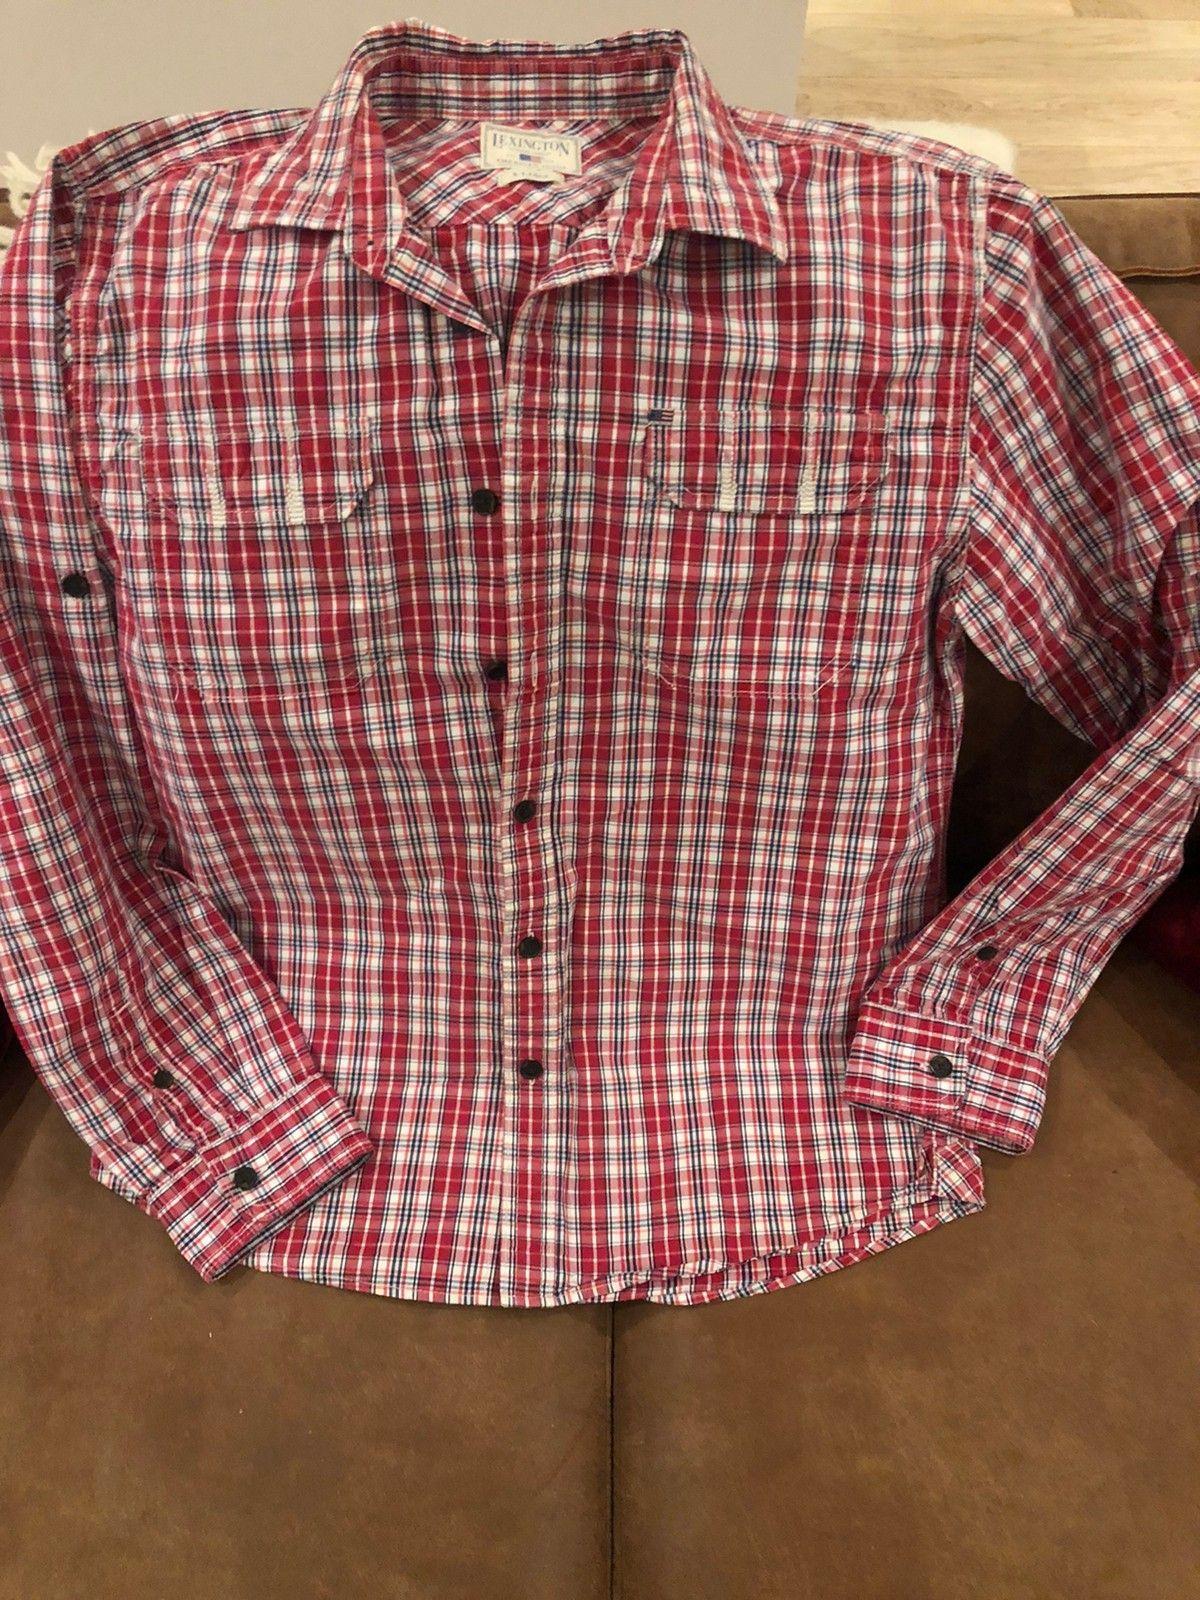 Lexington skjorte, dame | FINN.no